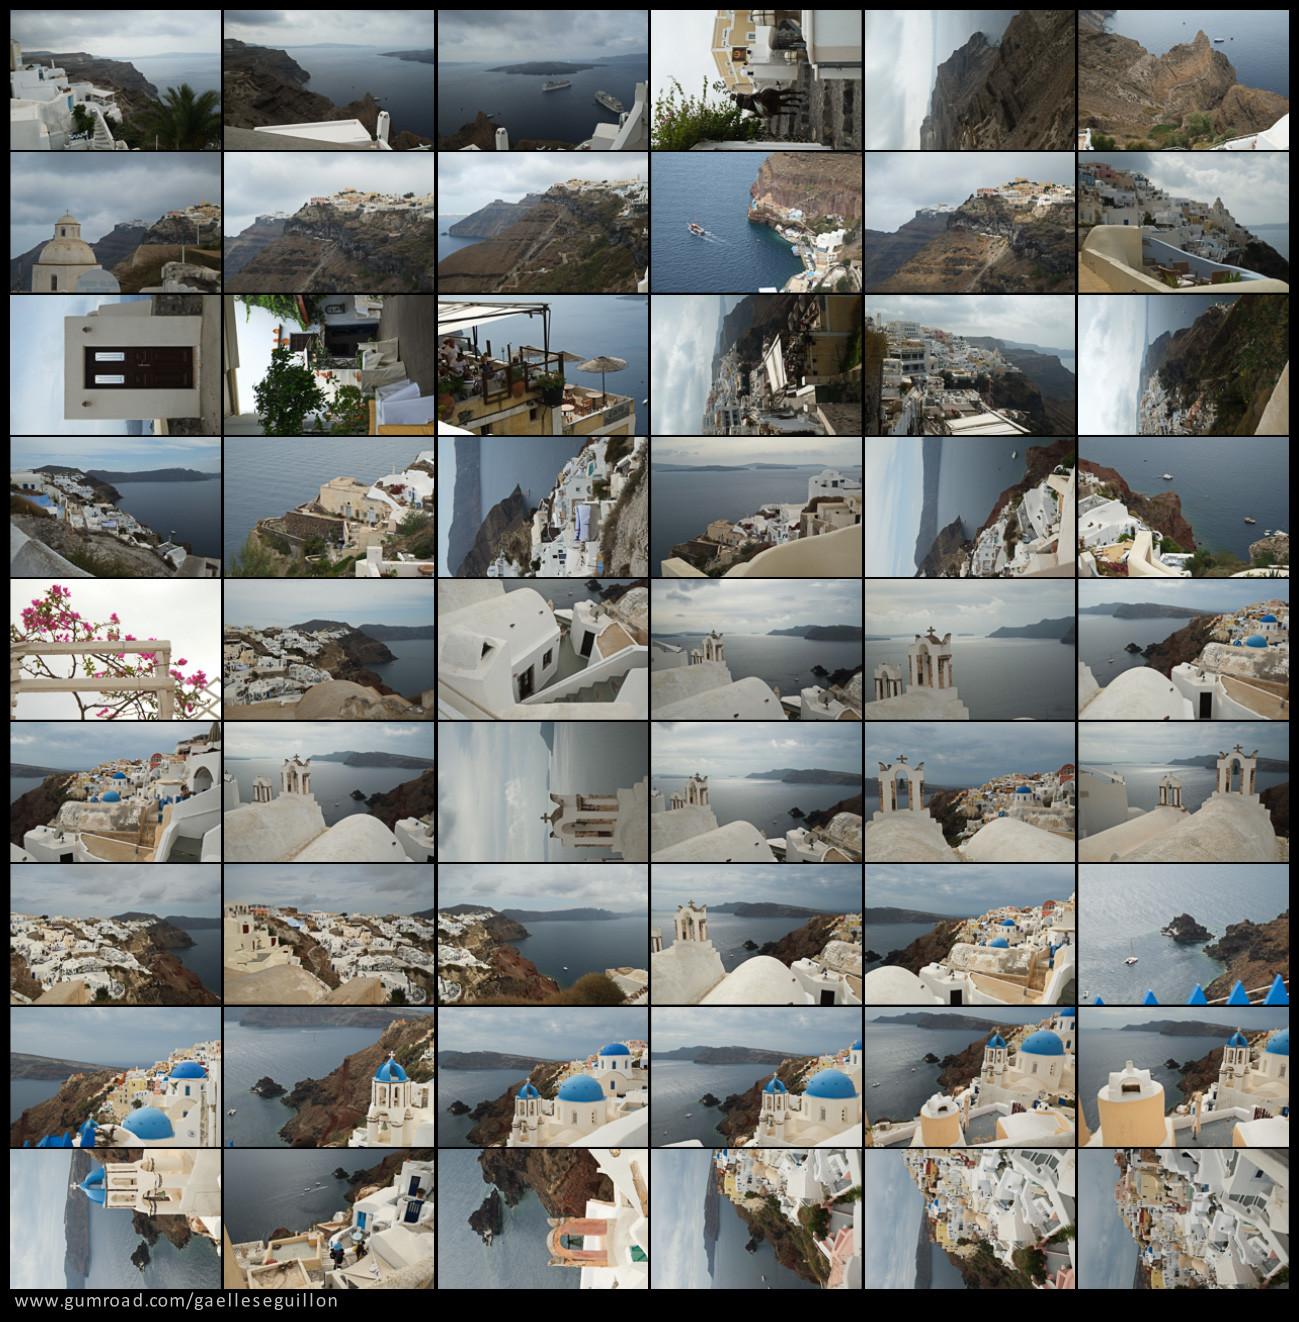 Santorini preview 1